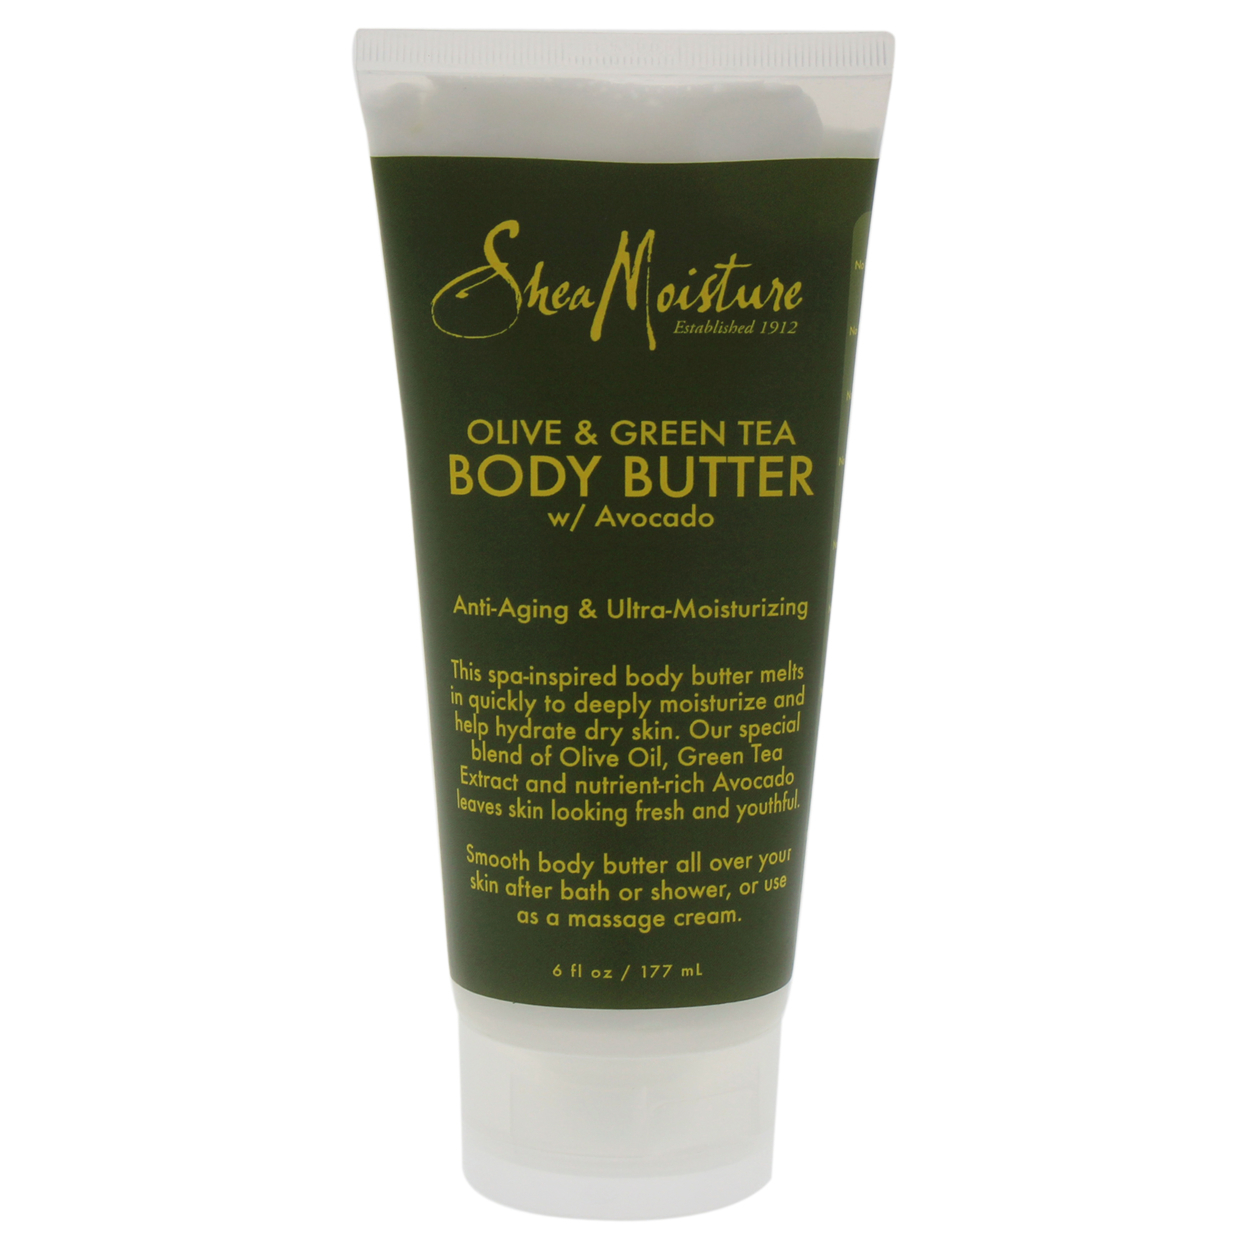 Olive & Green Tea Body Butter Anti-aging & Ultra-moisturzing By Shea Moisture For Unisex 6 Oz Cream